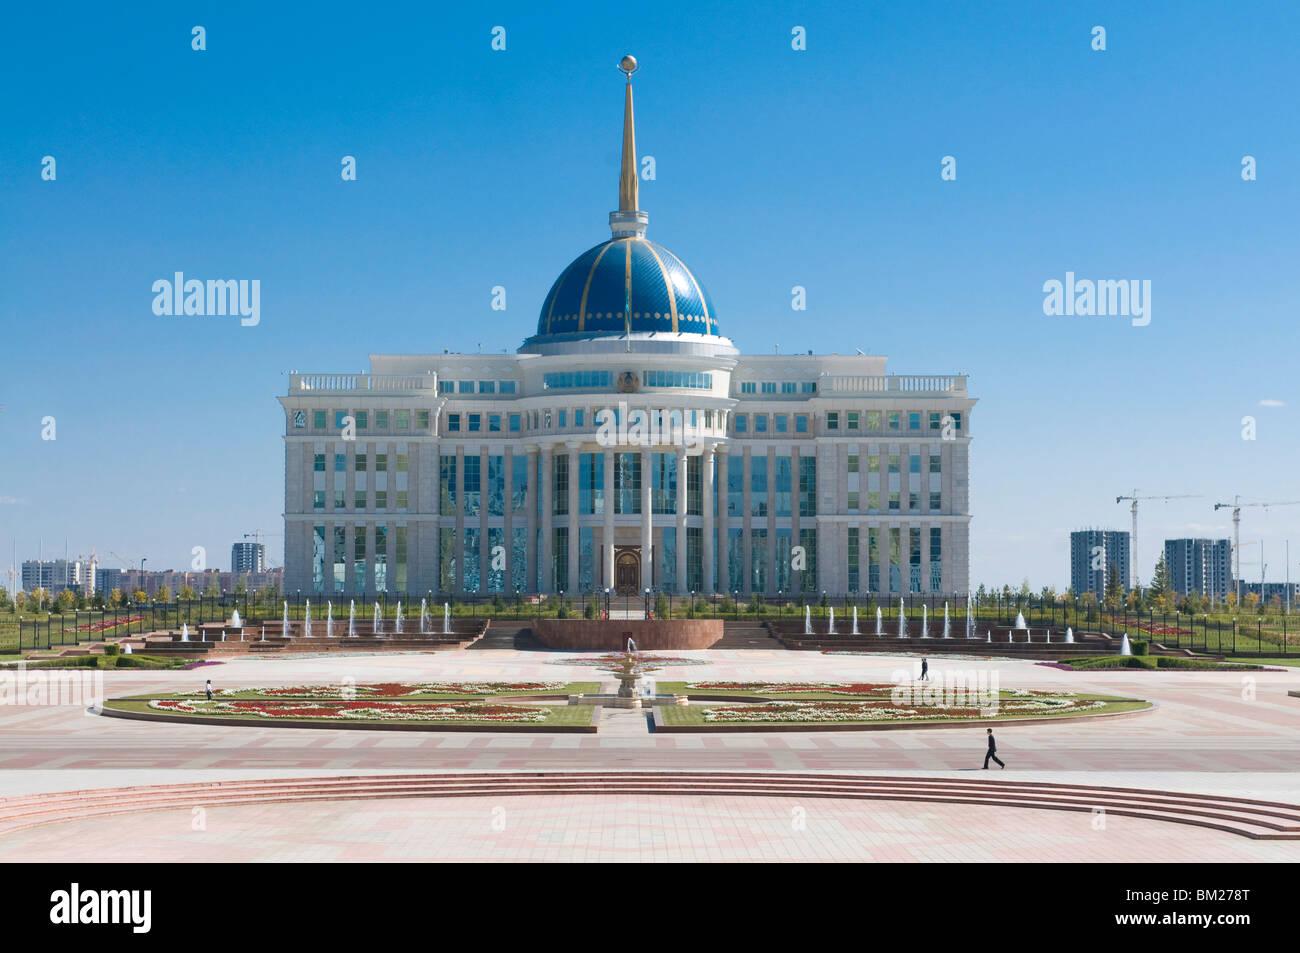 Presidential Palace, Astana, Kazakhstan, Central Asia - Stock Image